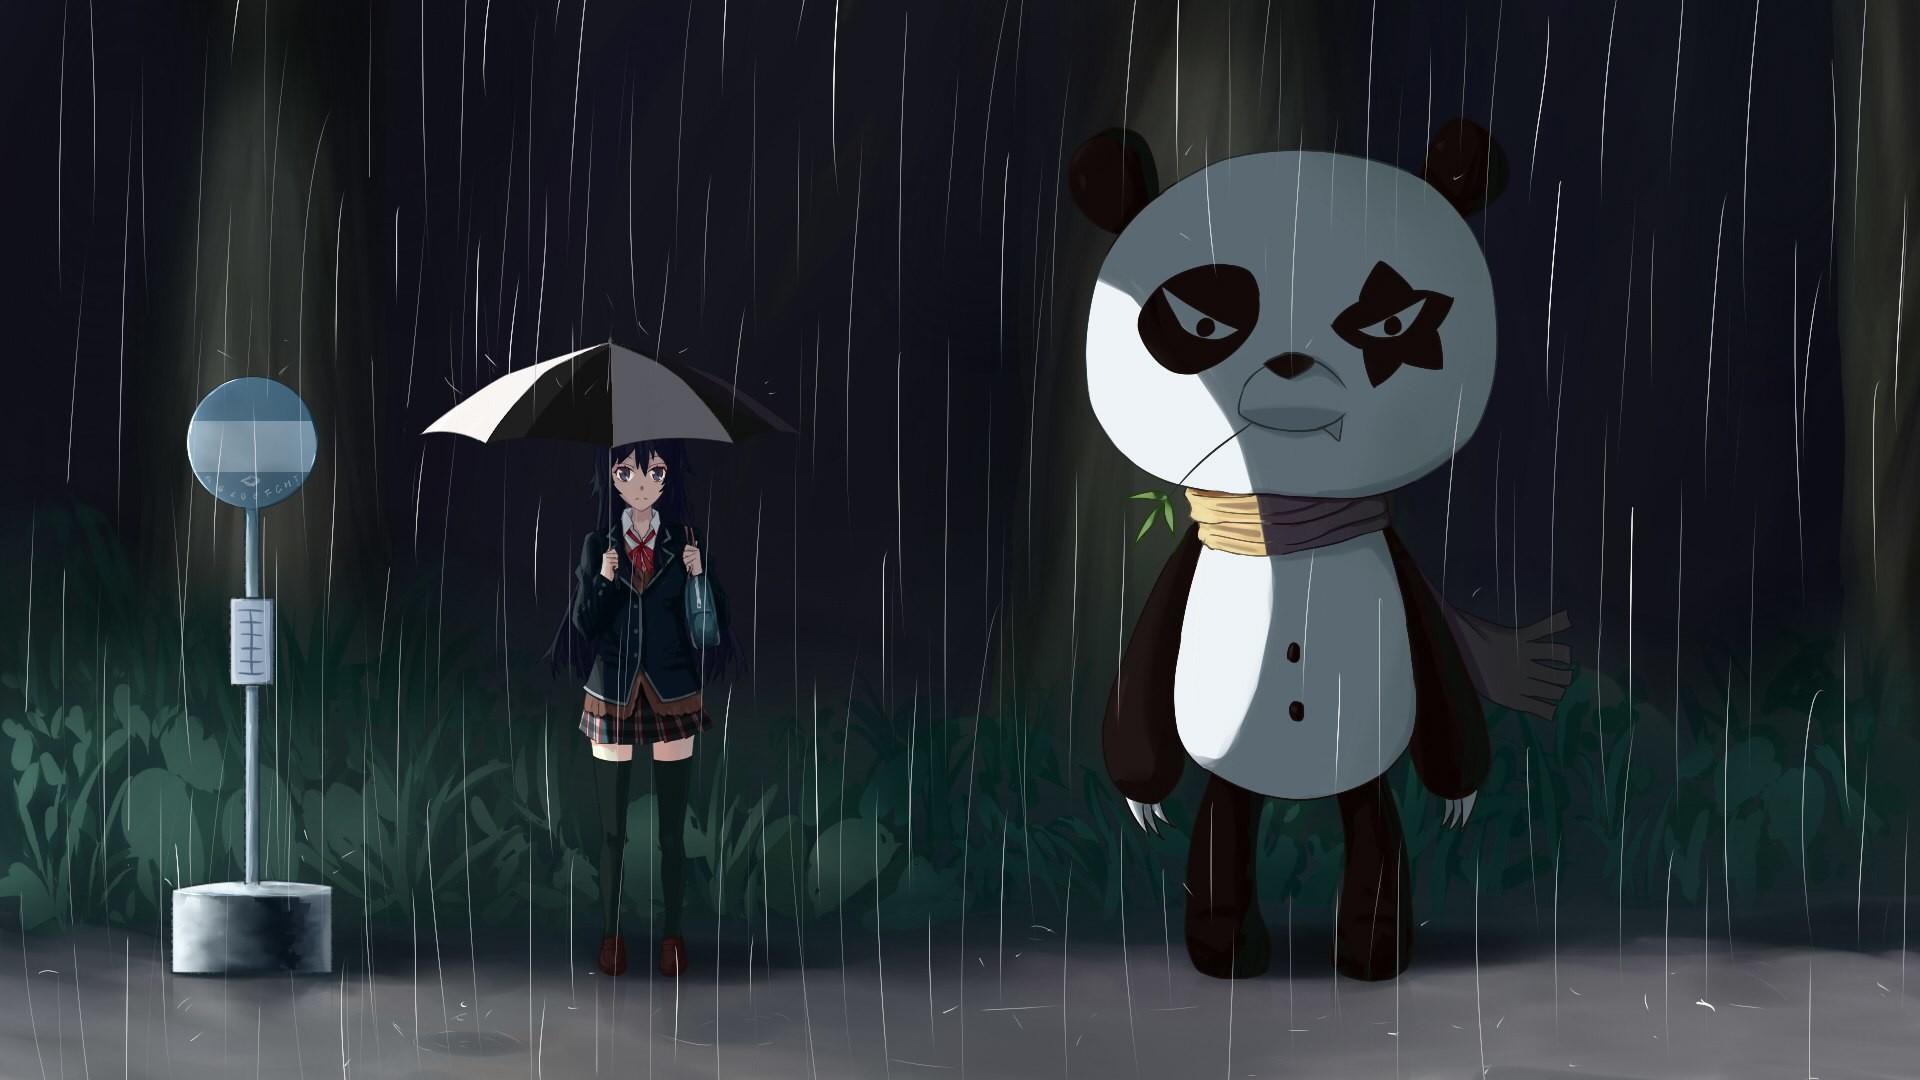 Anime – Crossover Yukino Yukinoshita My Neighbor Totoro Wallpaper